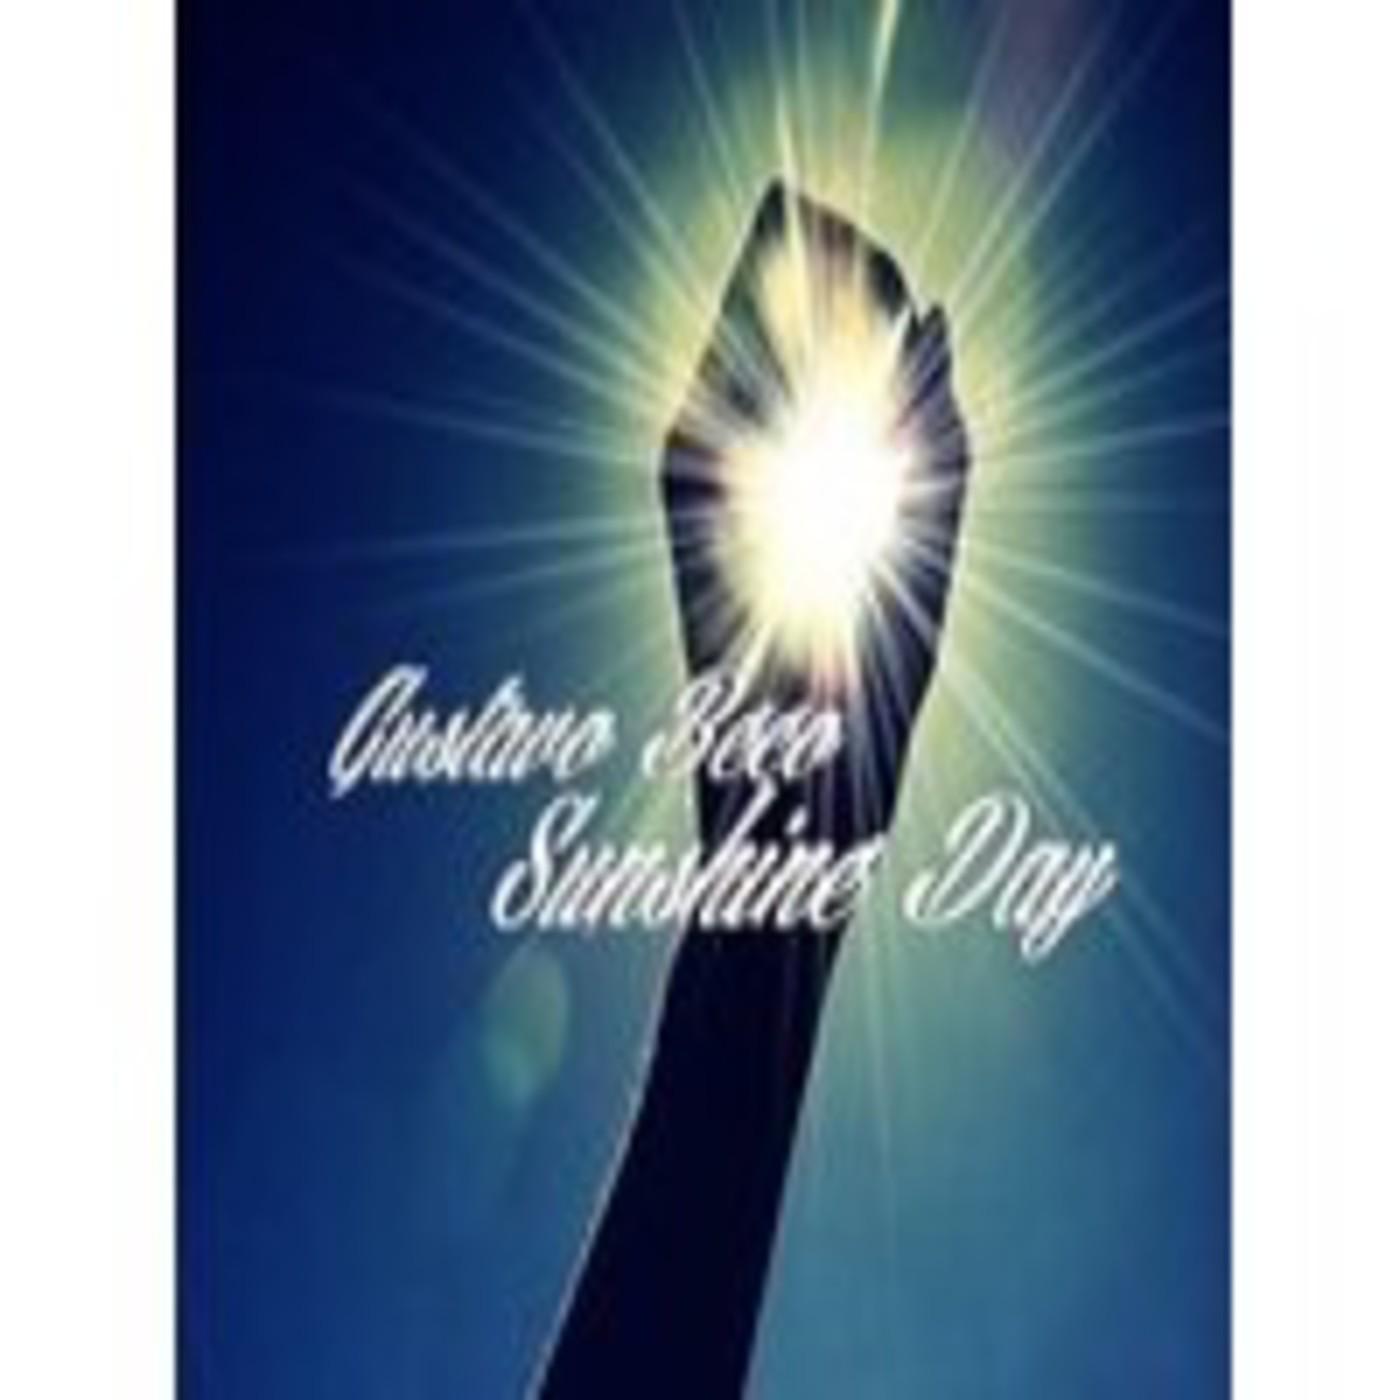 Gustavo Beco Presents Sunshine Day Episode 001